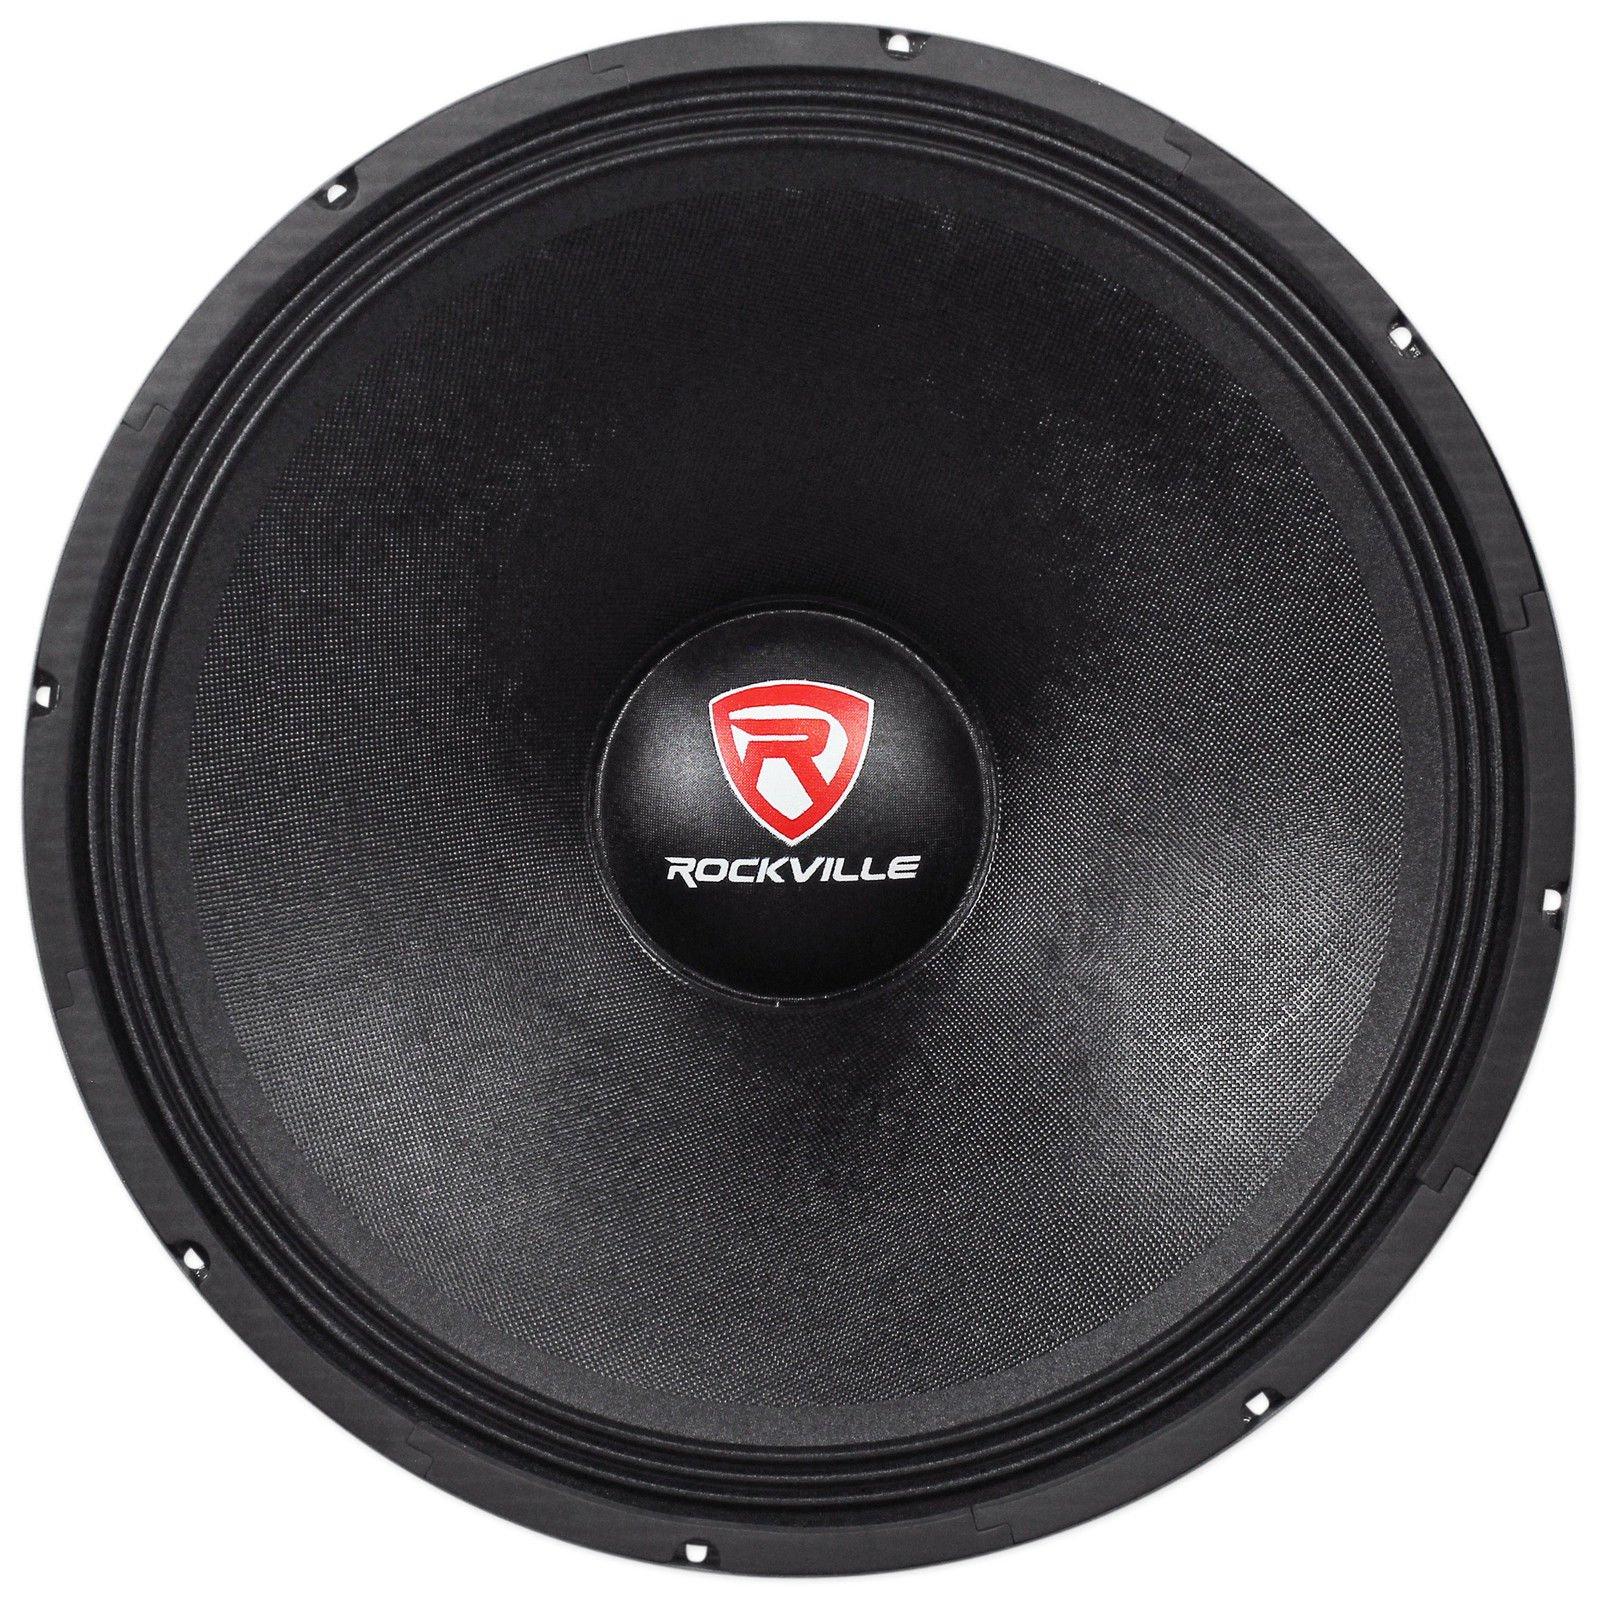 Rockville RVW1800P4 1800w 18'' Raw DJ Subwoofer 4 Ohm Sub Woofer 107OZ Magnet